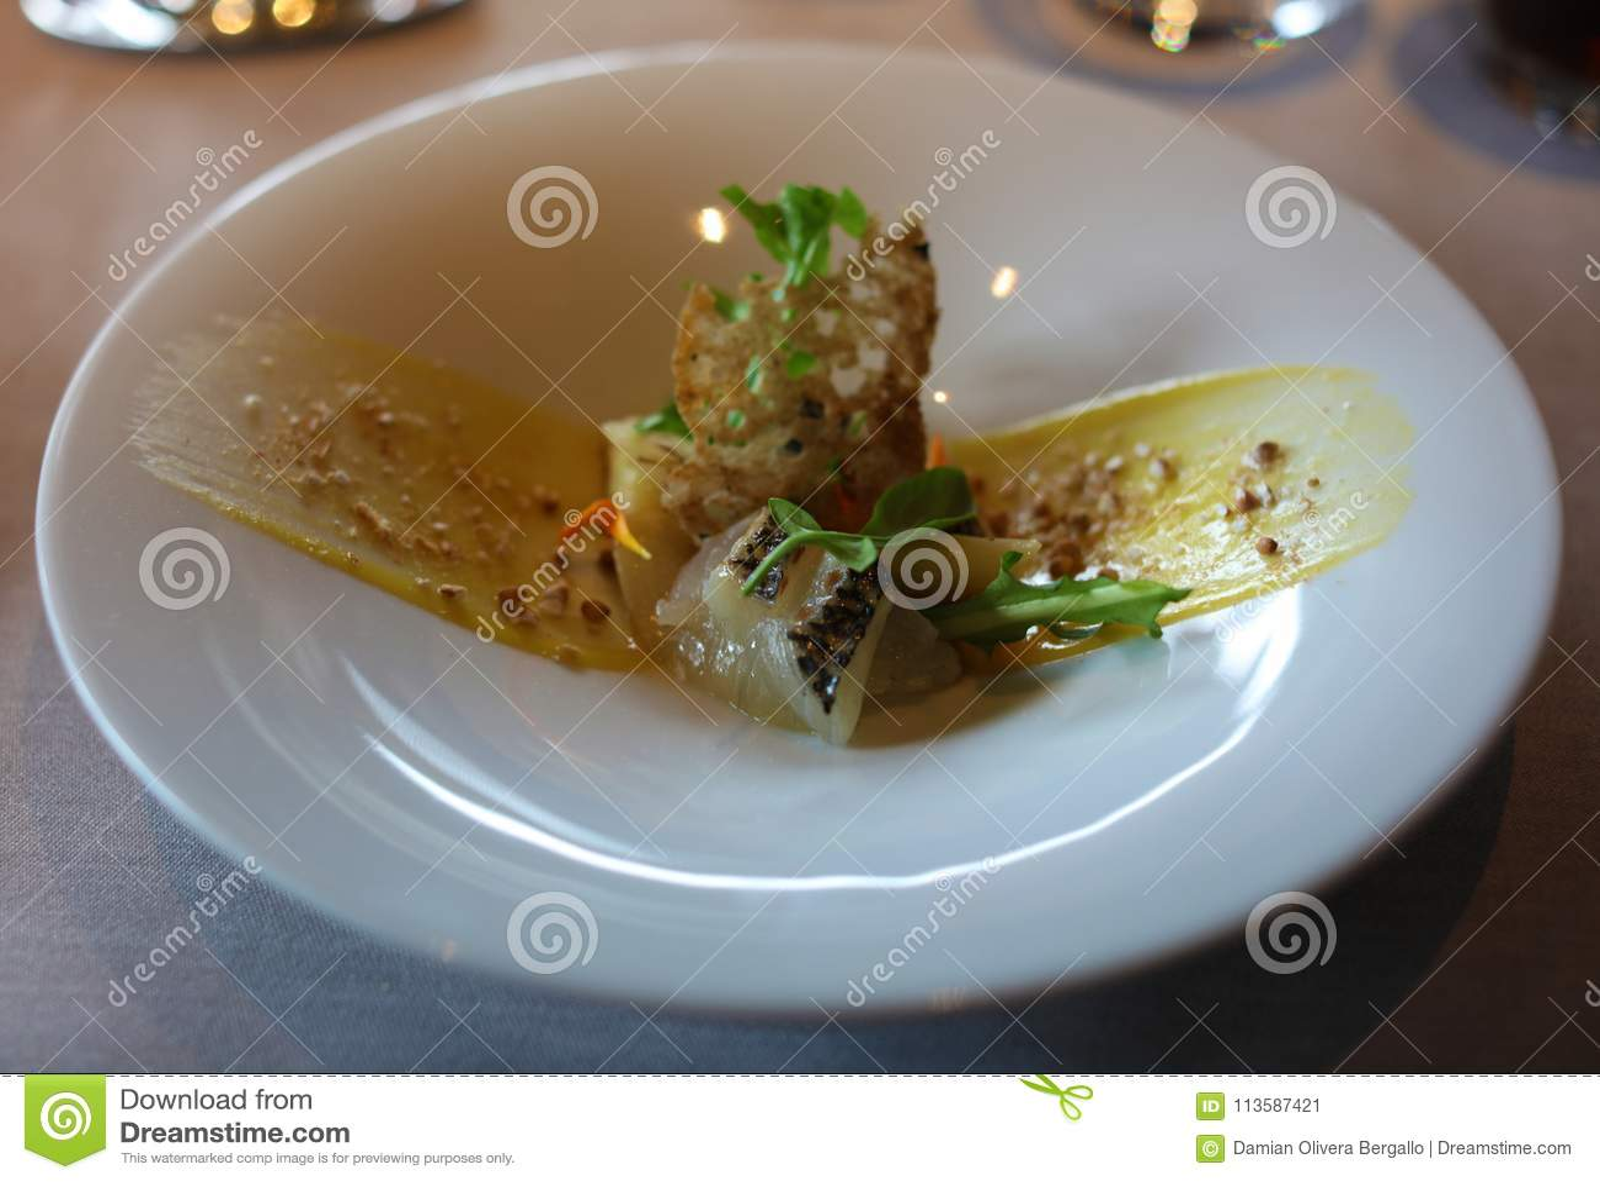 Marinated sea bream with bergamot and lemon sause, luxury meal unique cuisine in VIP gastronomy restaurant